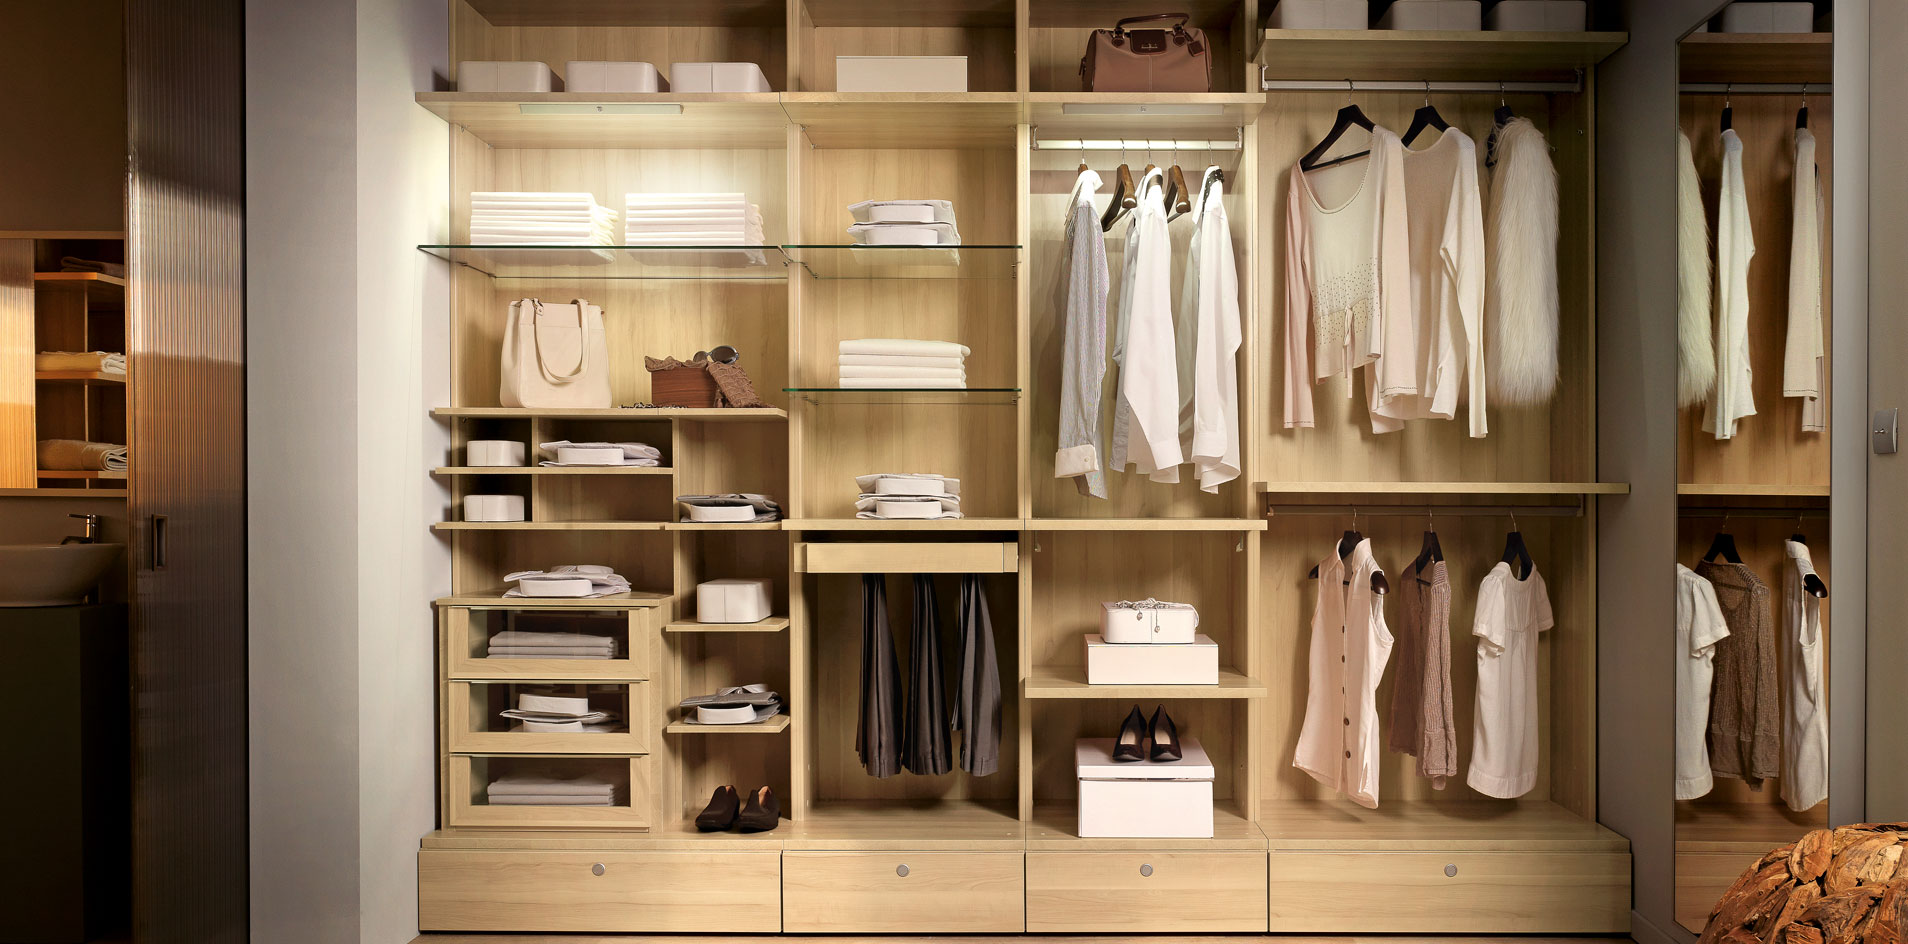 le dressing d angle donne du cachet ma pi ce. Black Bedroom Furniture Sets. Home Design Ideas